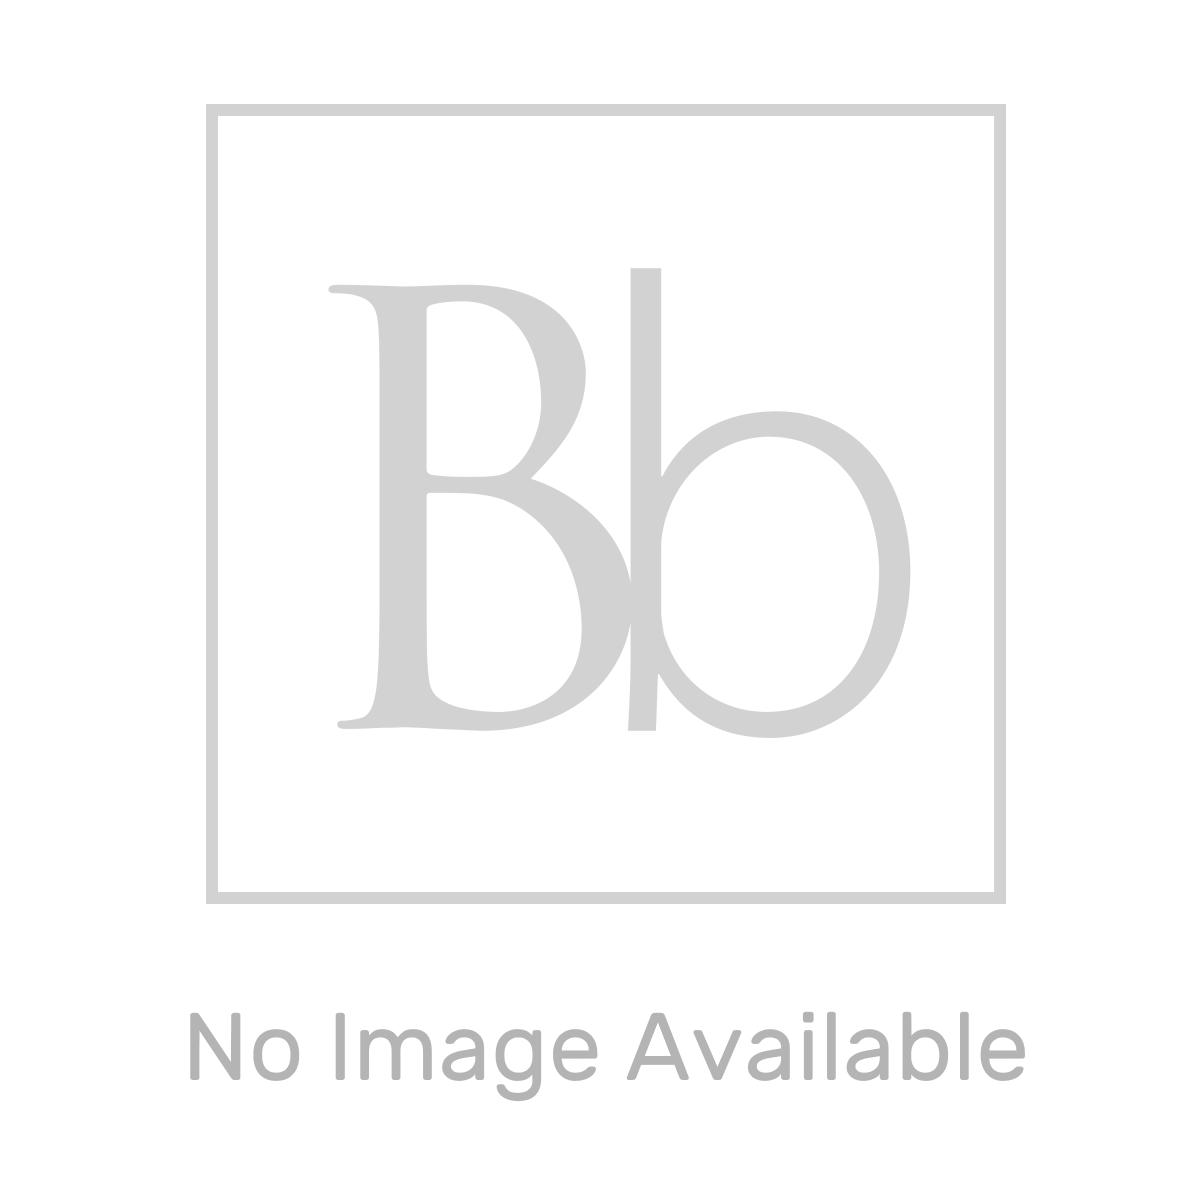 HiB Ambience 50 LED Steam Free Bathroom Mirror